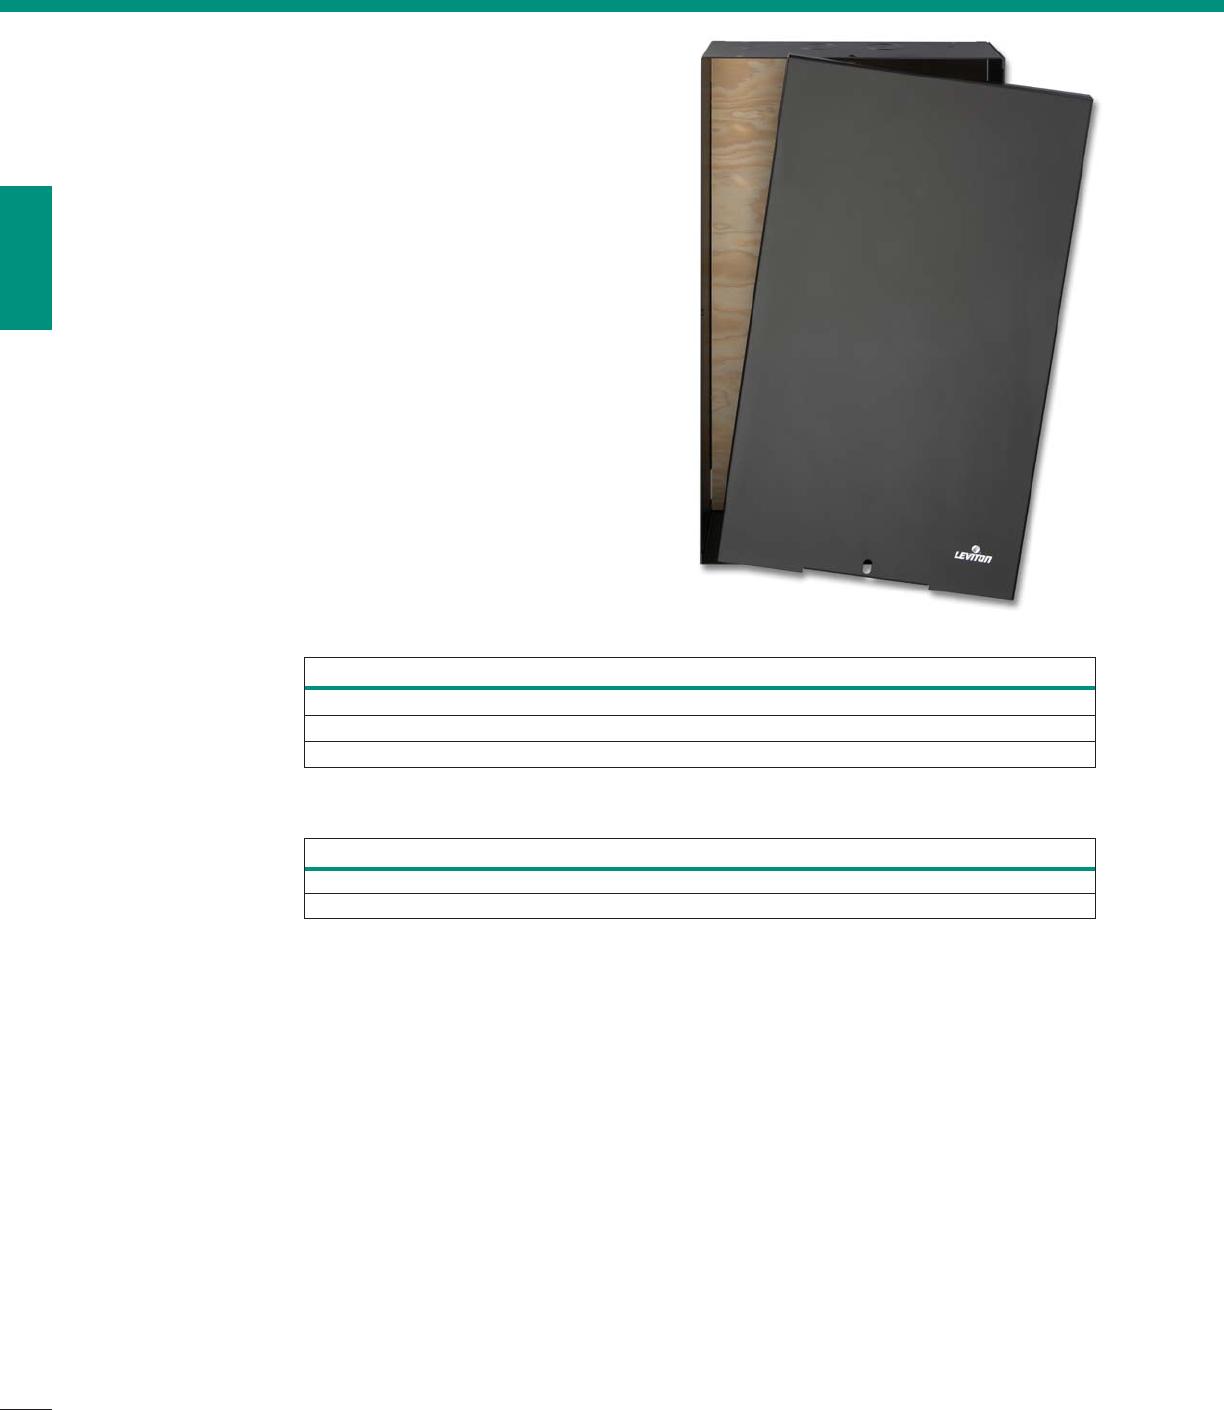 Leviton Ivory LARGE Flush Phone Jack Wall Plate 6-Wire 6-Conductor 625B4 40538-I